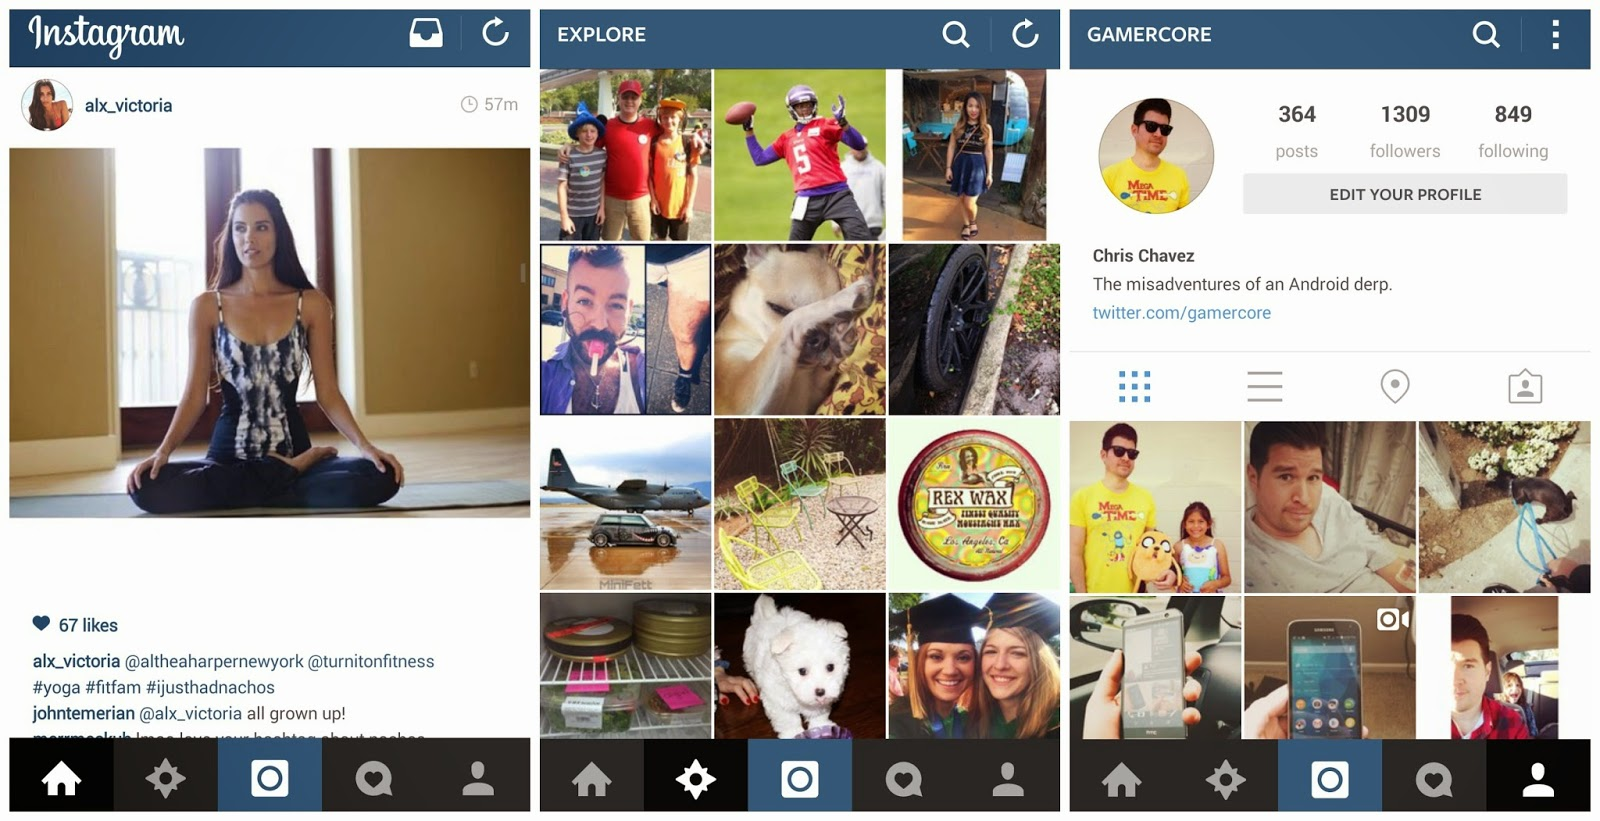 Sejarah Asal Mula Media Sosial Instagram - SATUPEDANG.BLOGSPOT